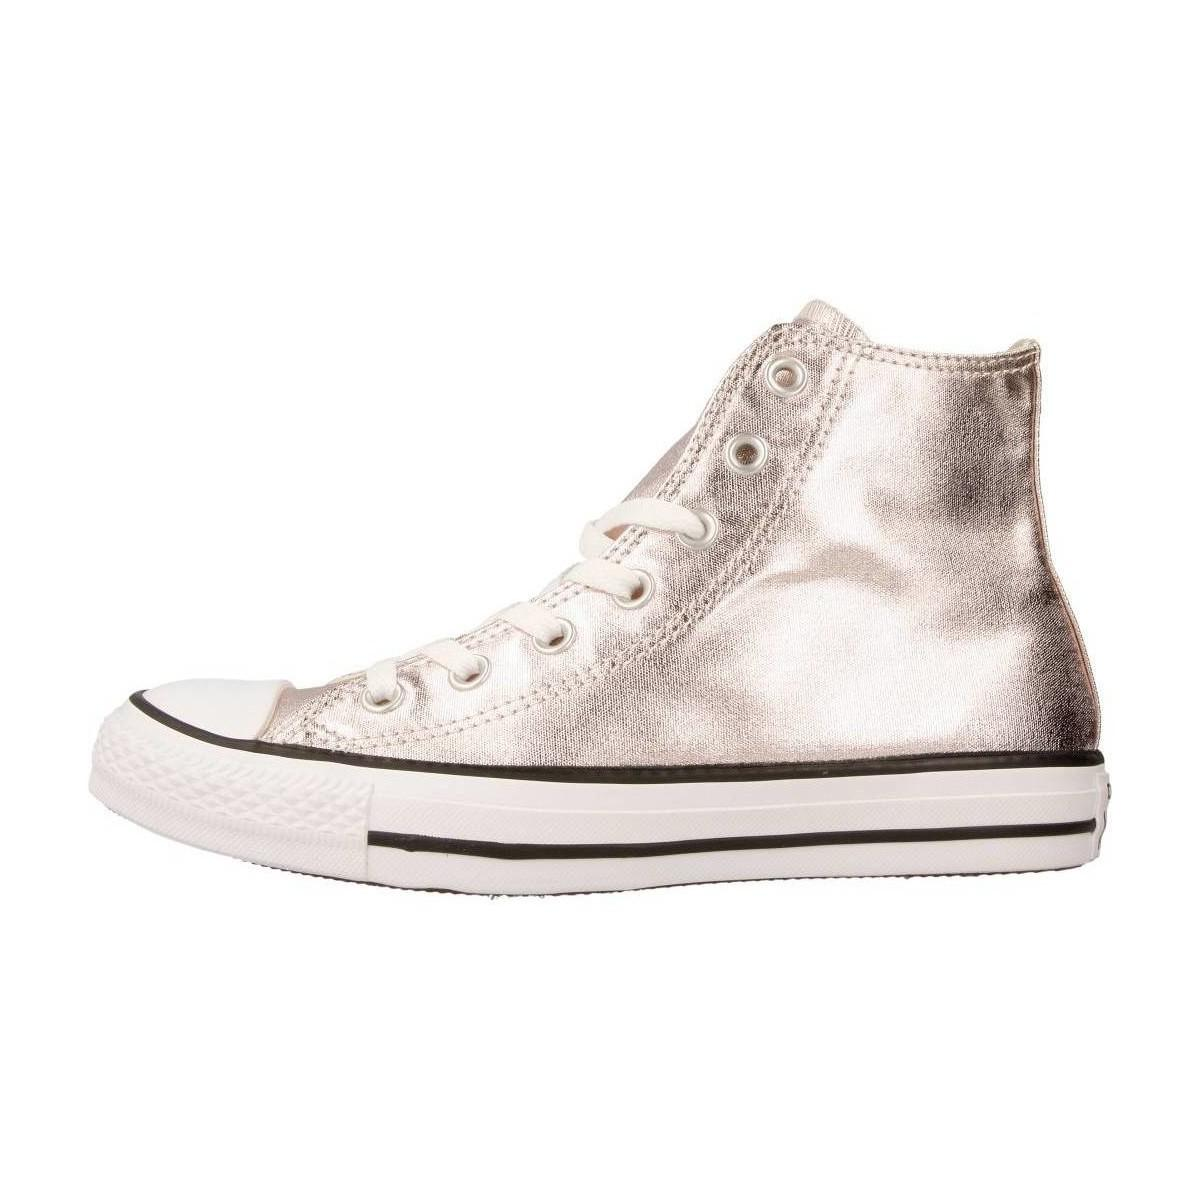 6b73f1f207c1 Converse Ctas Hi Rose Quartz white b Women s Shoes (high-top ...